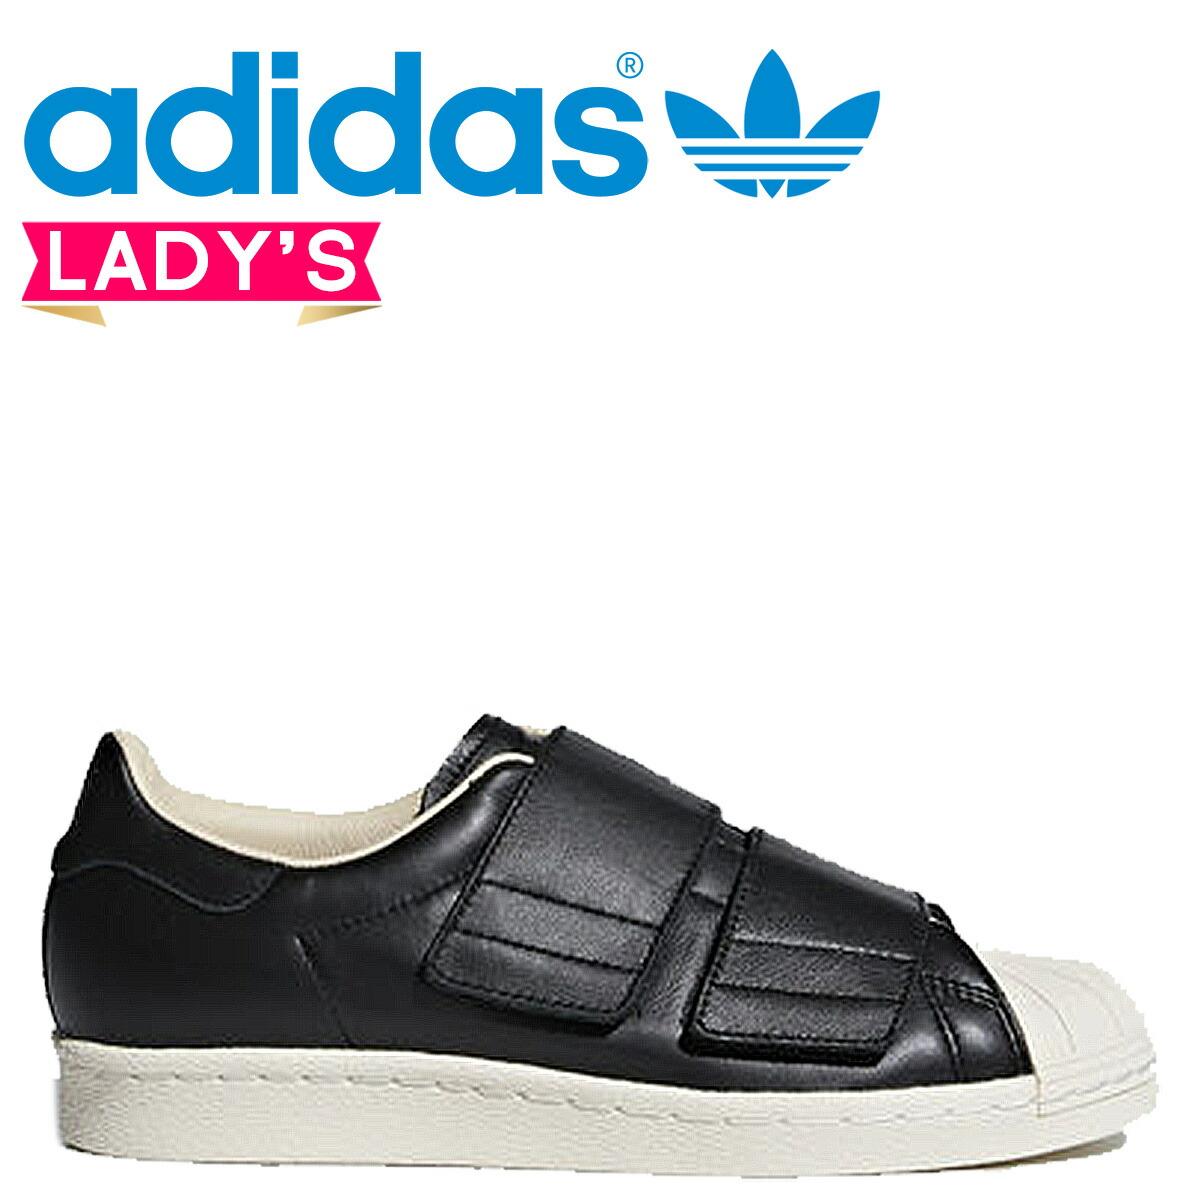 ALLSPORTS  Sneakers Velcro black originals lady s for adidas ... 0c40adf99